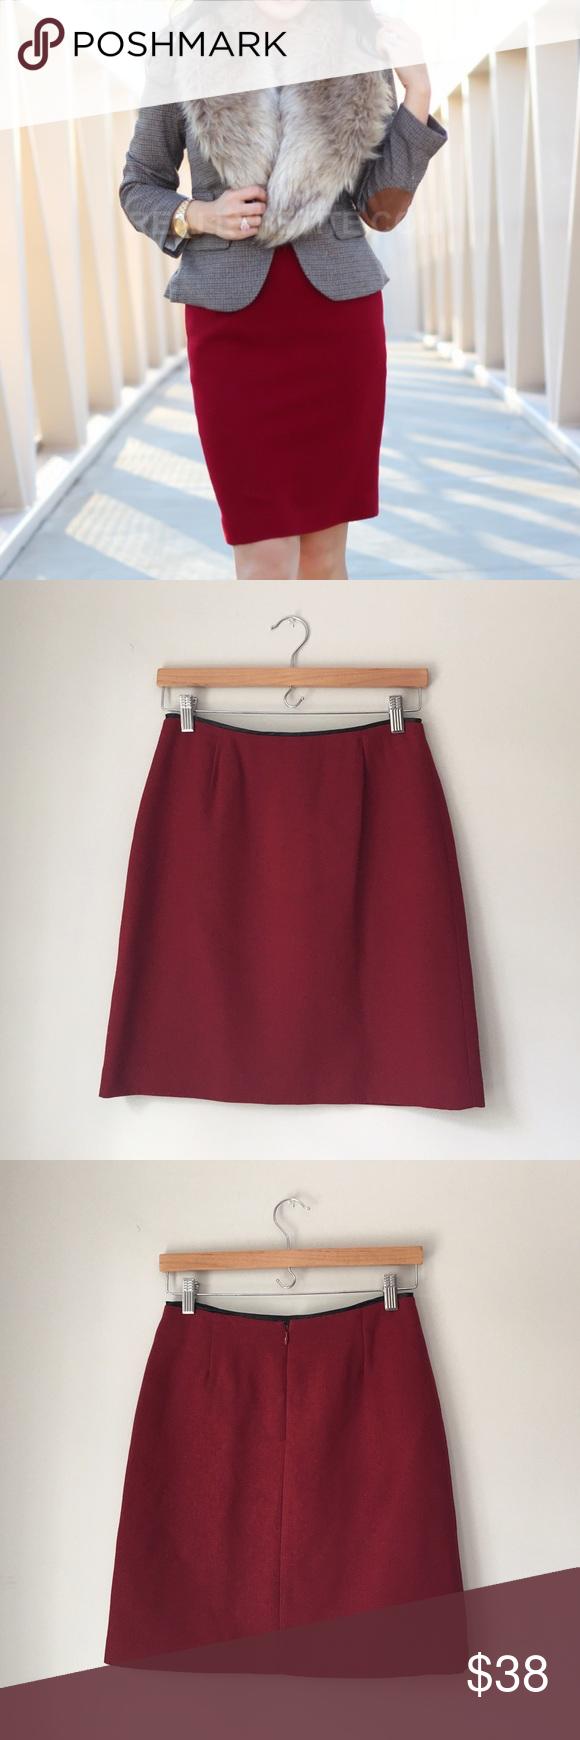 GAP Burgandy Red Pencil Skirt Stunning burgandy red pencil skirt by GAP. 50% polyester 50% rayon. Rear zip with hook and eye closure. Size 2. EUC. GAP Skirts Pencil